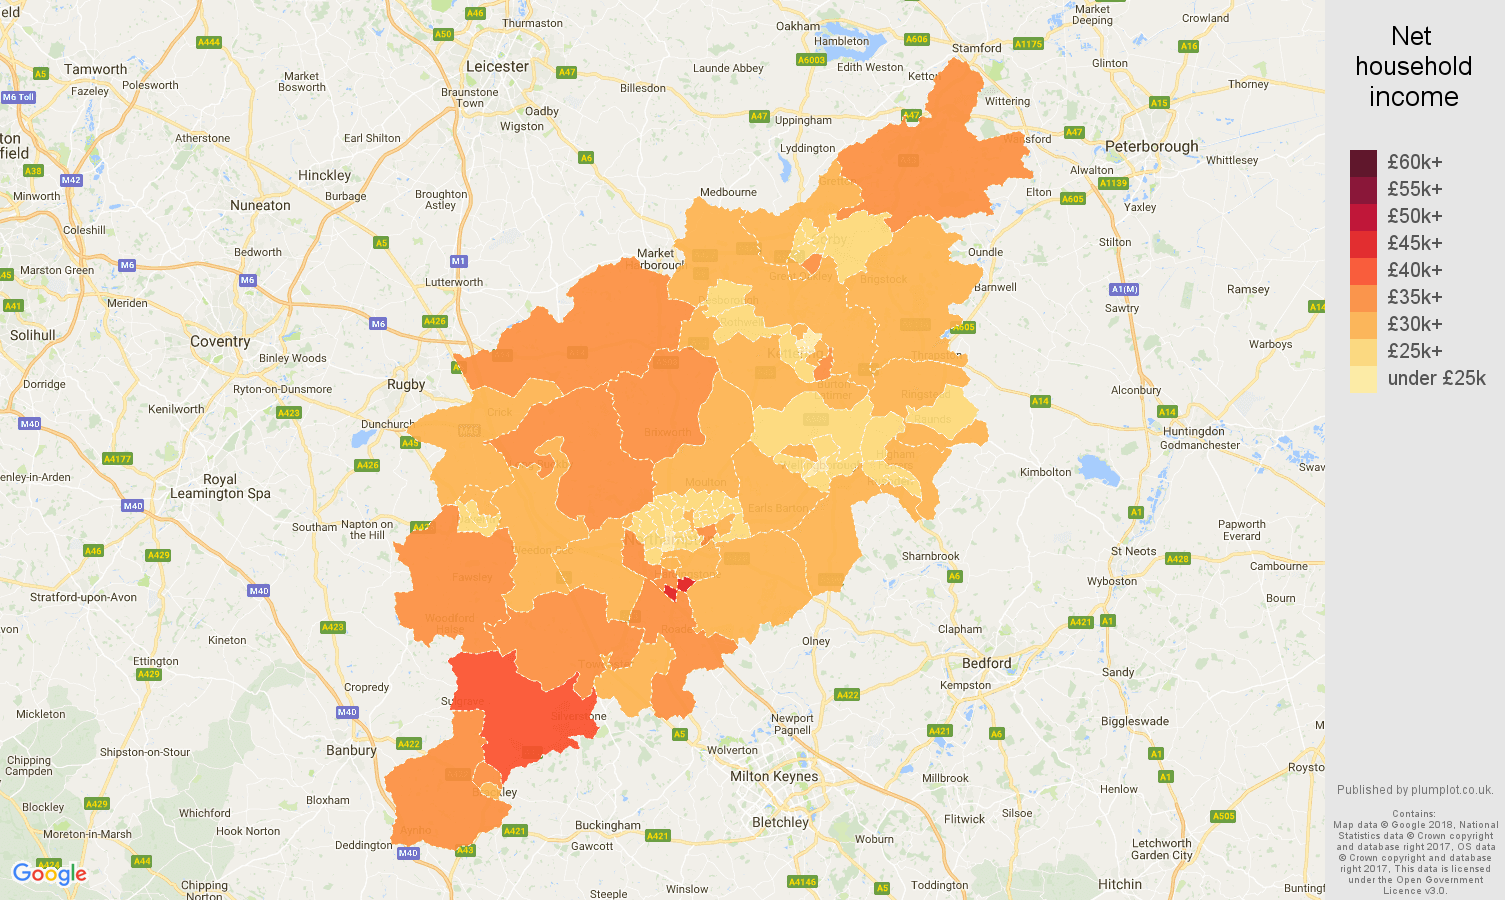 Northampton net household income map